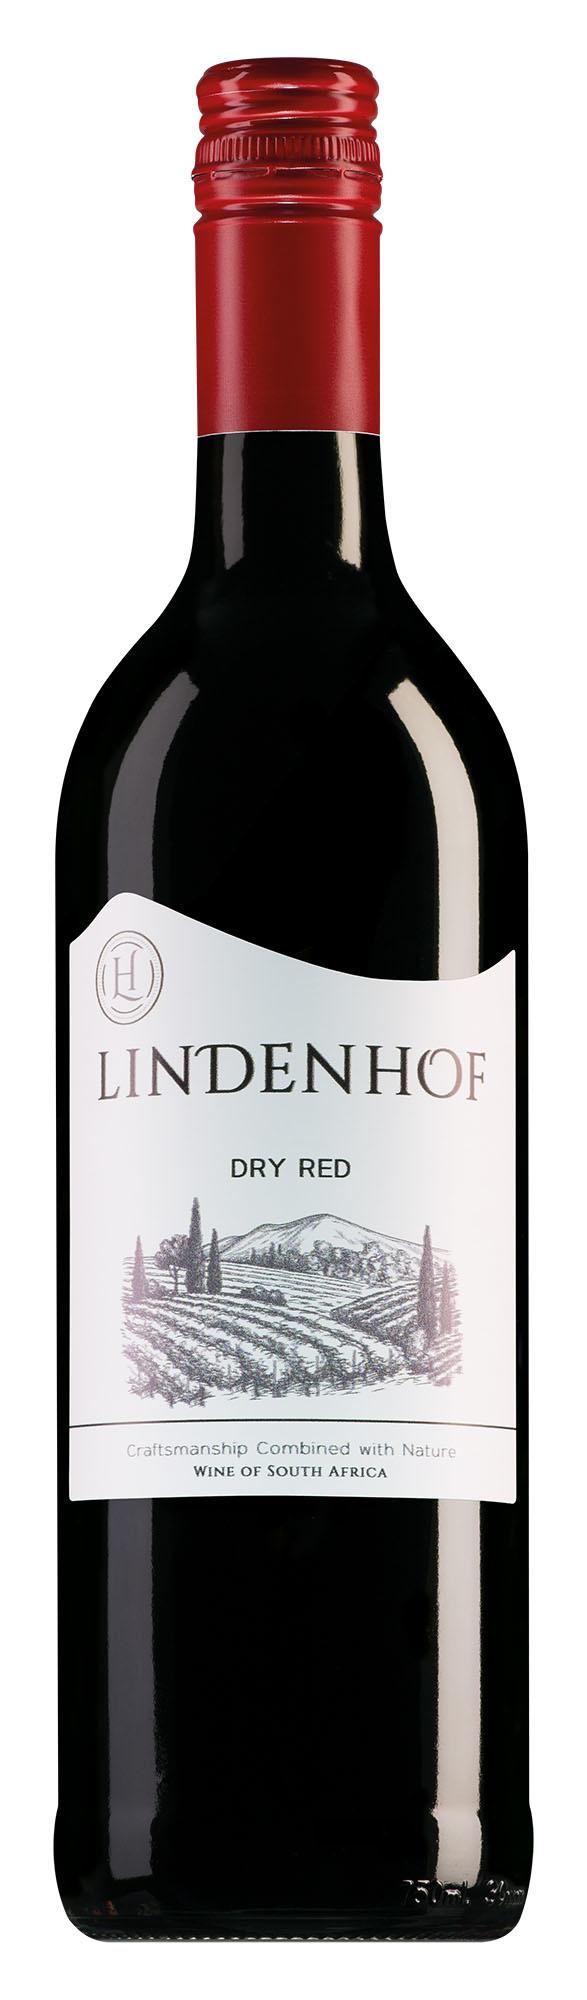 Lindenhof Dry Red 2018